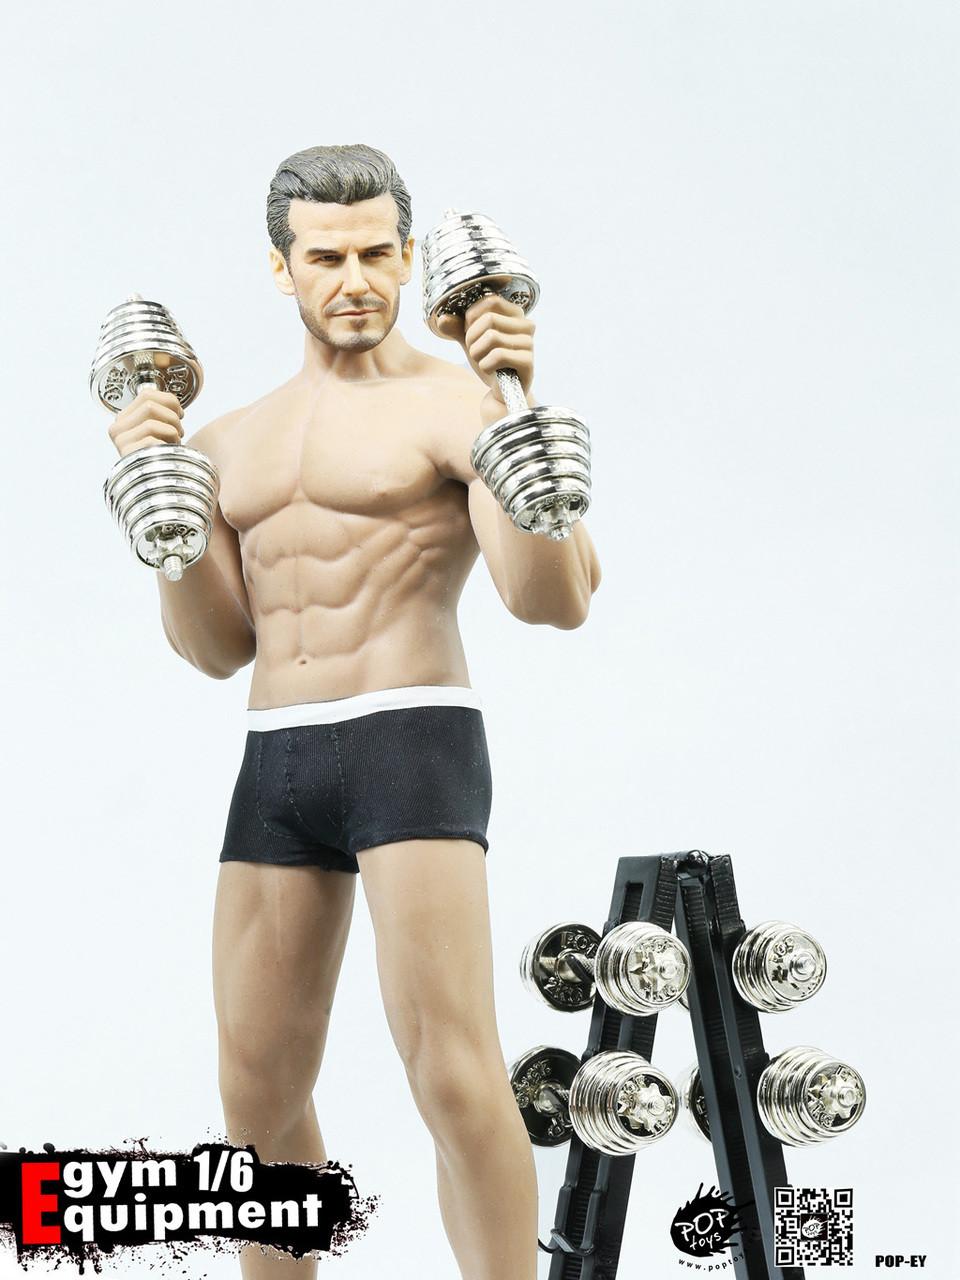 POPTOYS 1//6 action figure toys Fitness equipment Dumbbell dumbbell rack suits